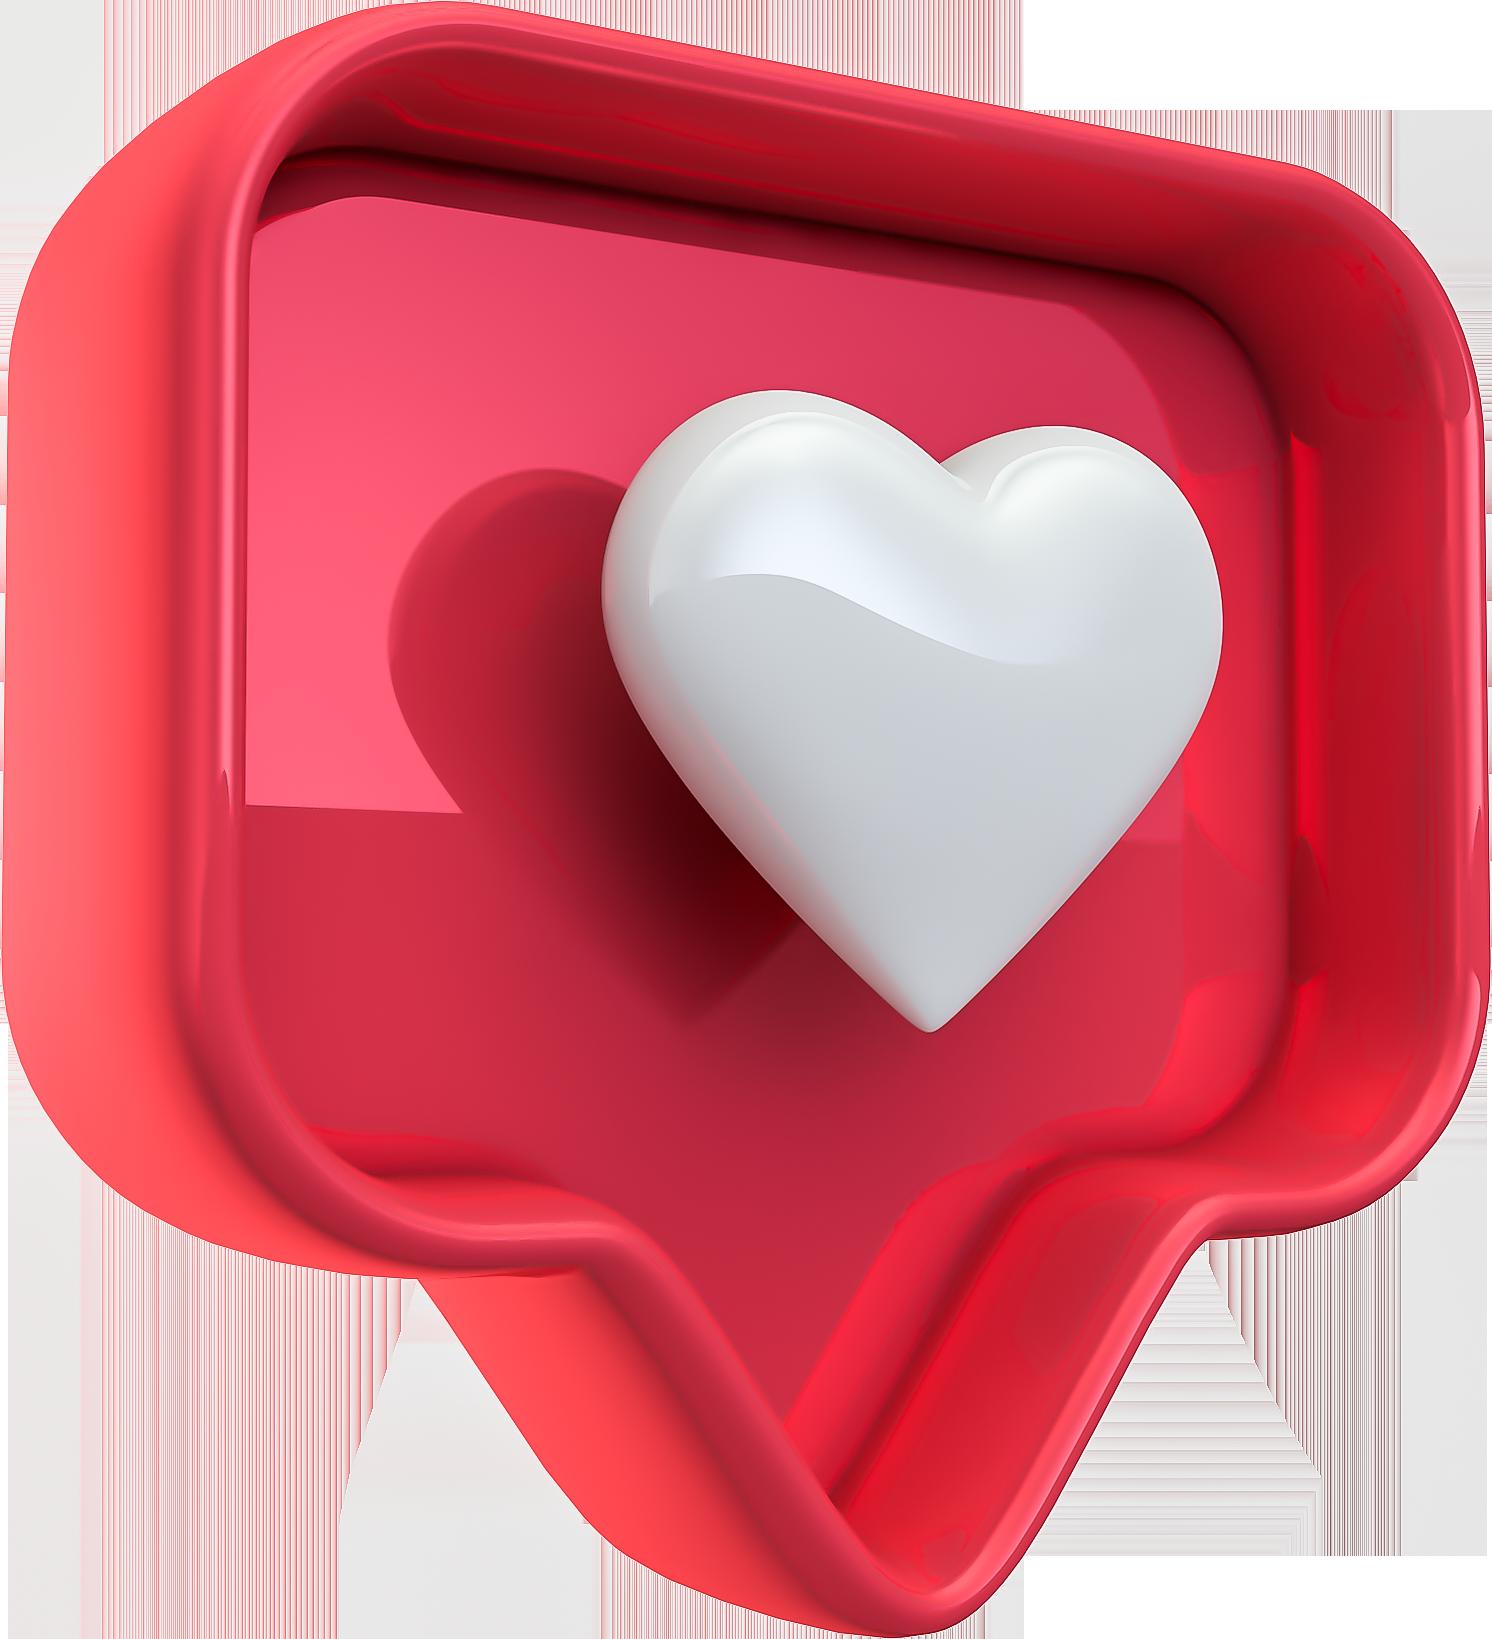 картинка сердечко лайк на прозрачном фоне входит бензобак